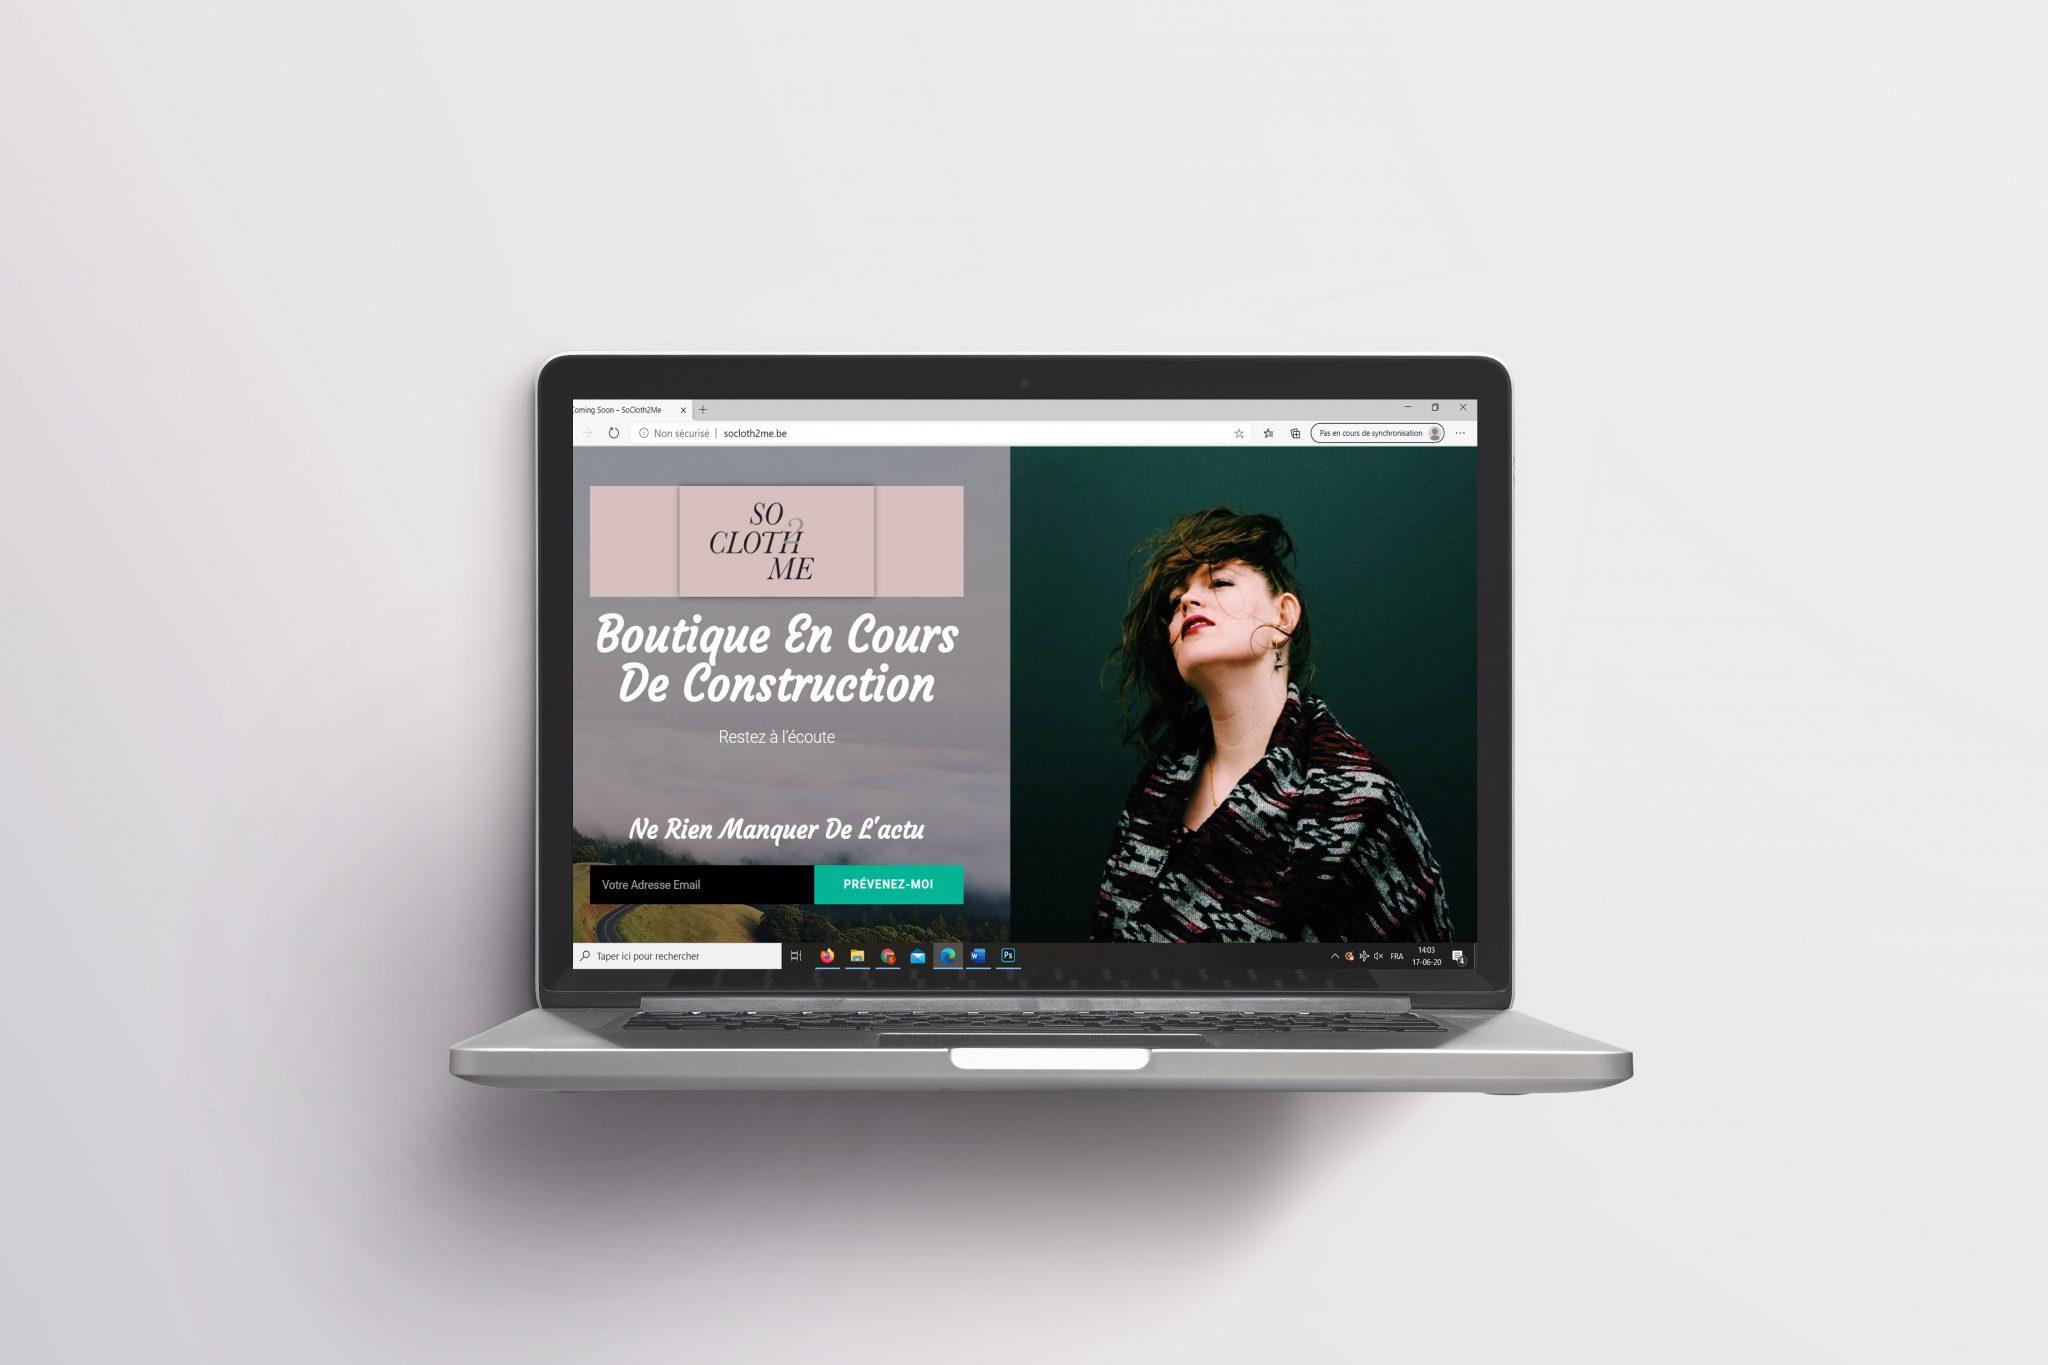 site-web-socloth2me-couverture-digifacotyr-2048x1365-1.jpg